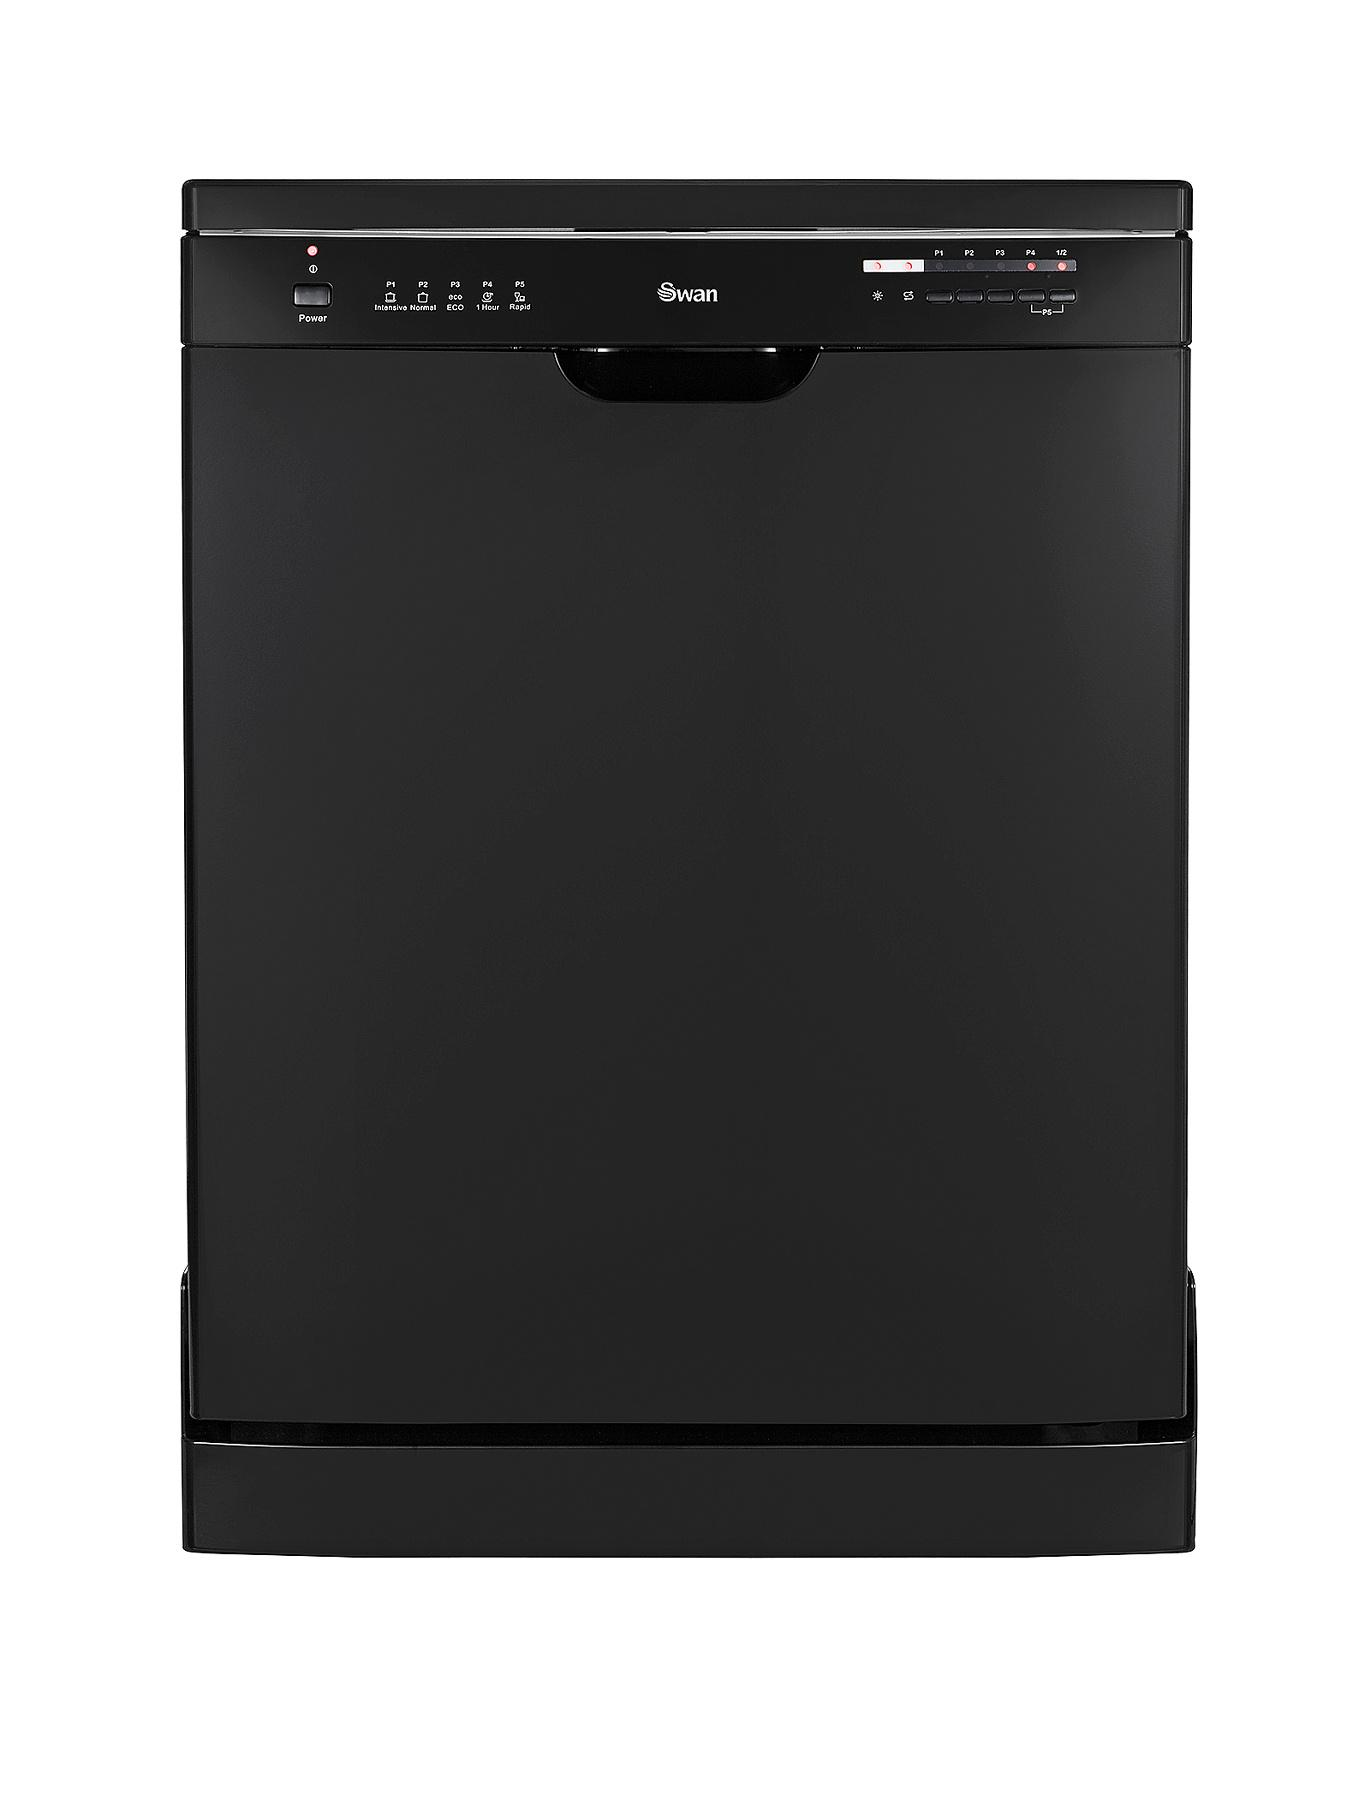 SDW7040B 12-Place Full Size Dishwasher - Black at Littlewoods